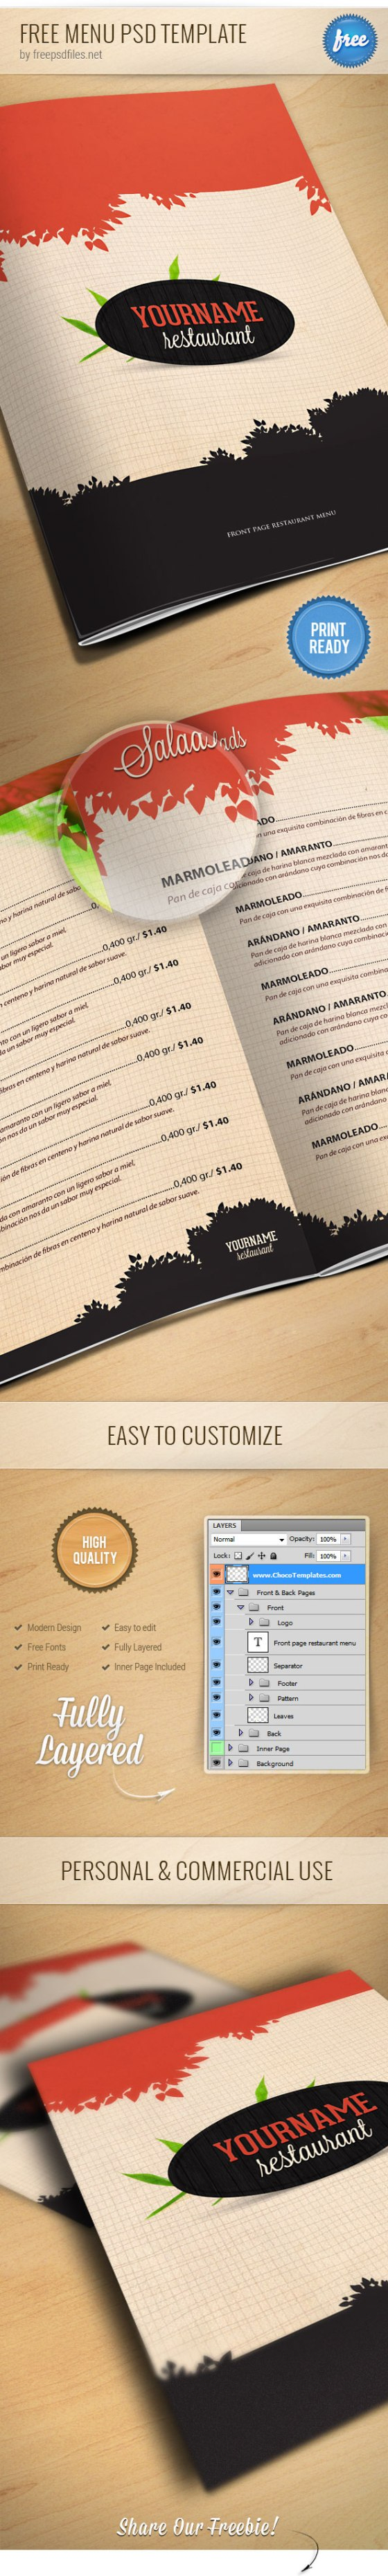 Restaurant_Menu_PSD_Template_Preview